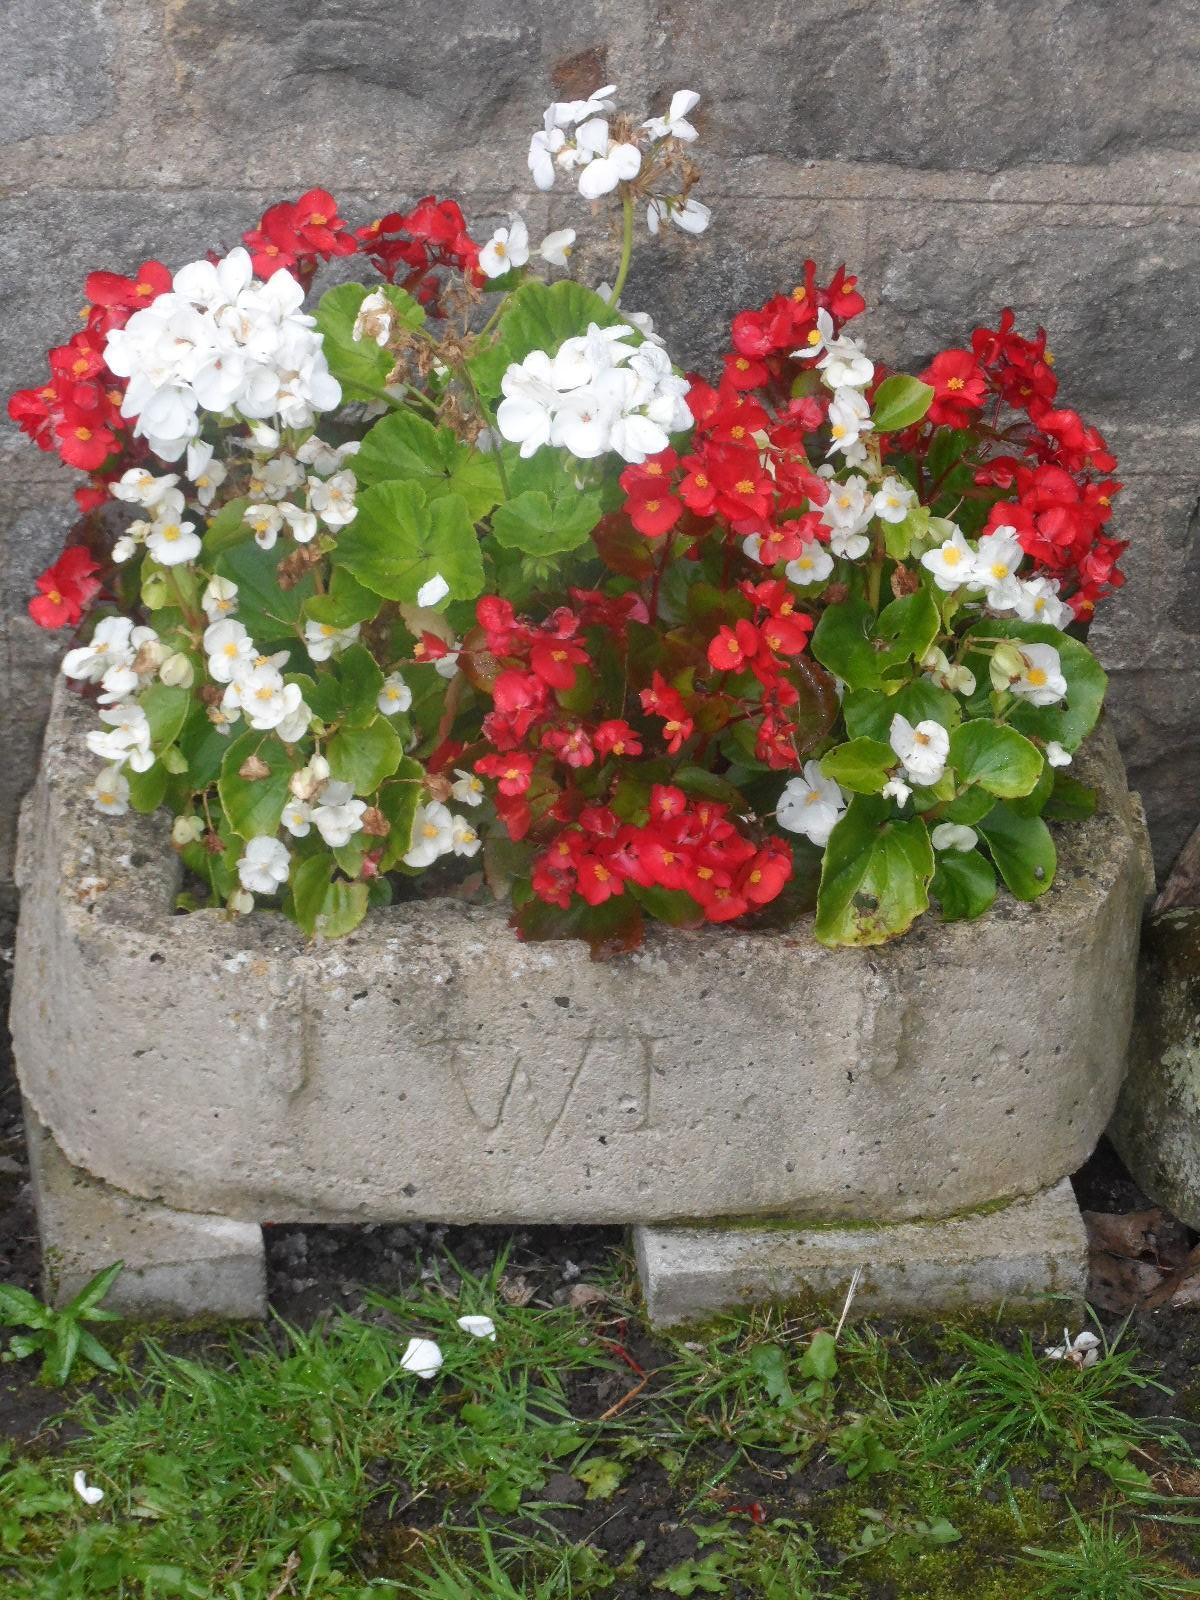 Stone basket of flowers